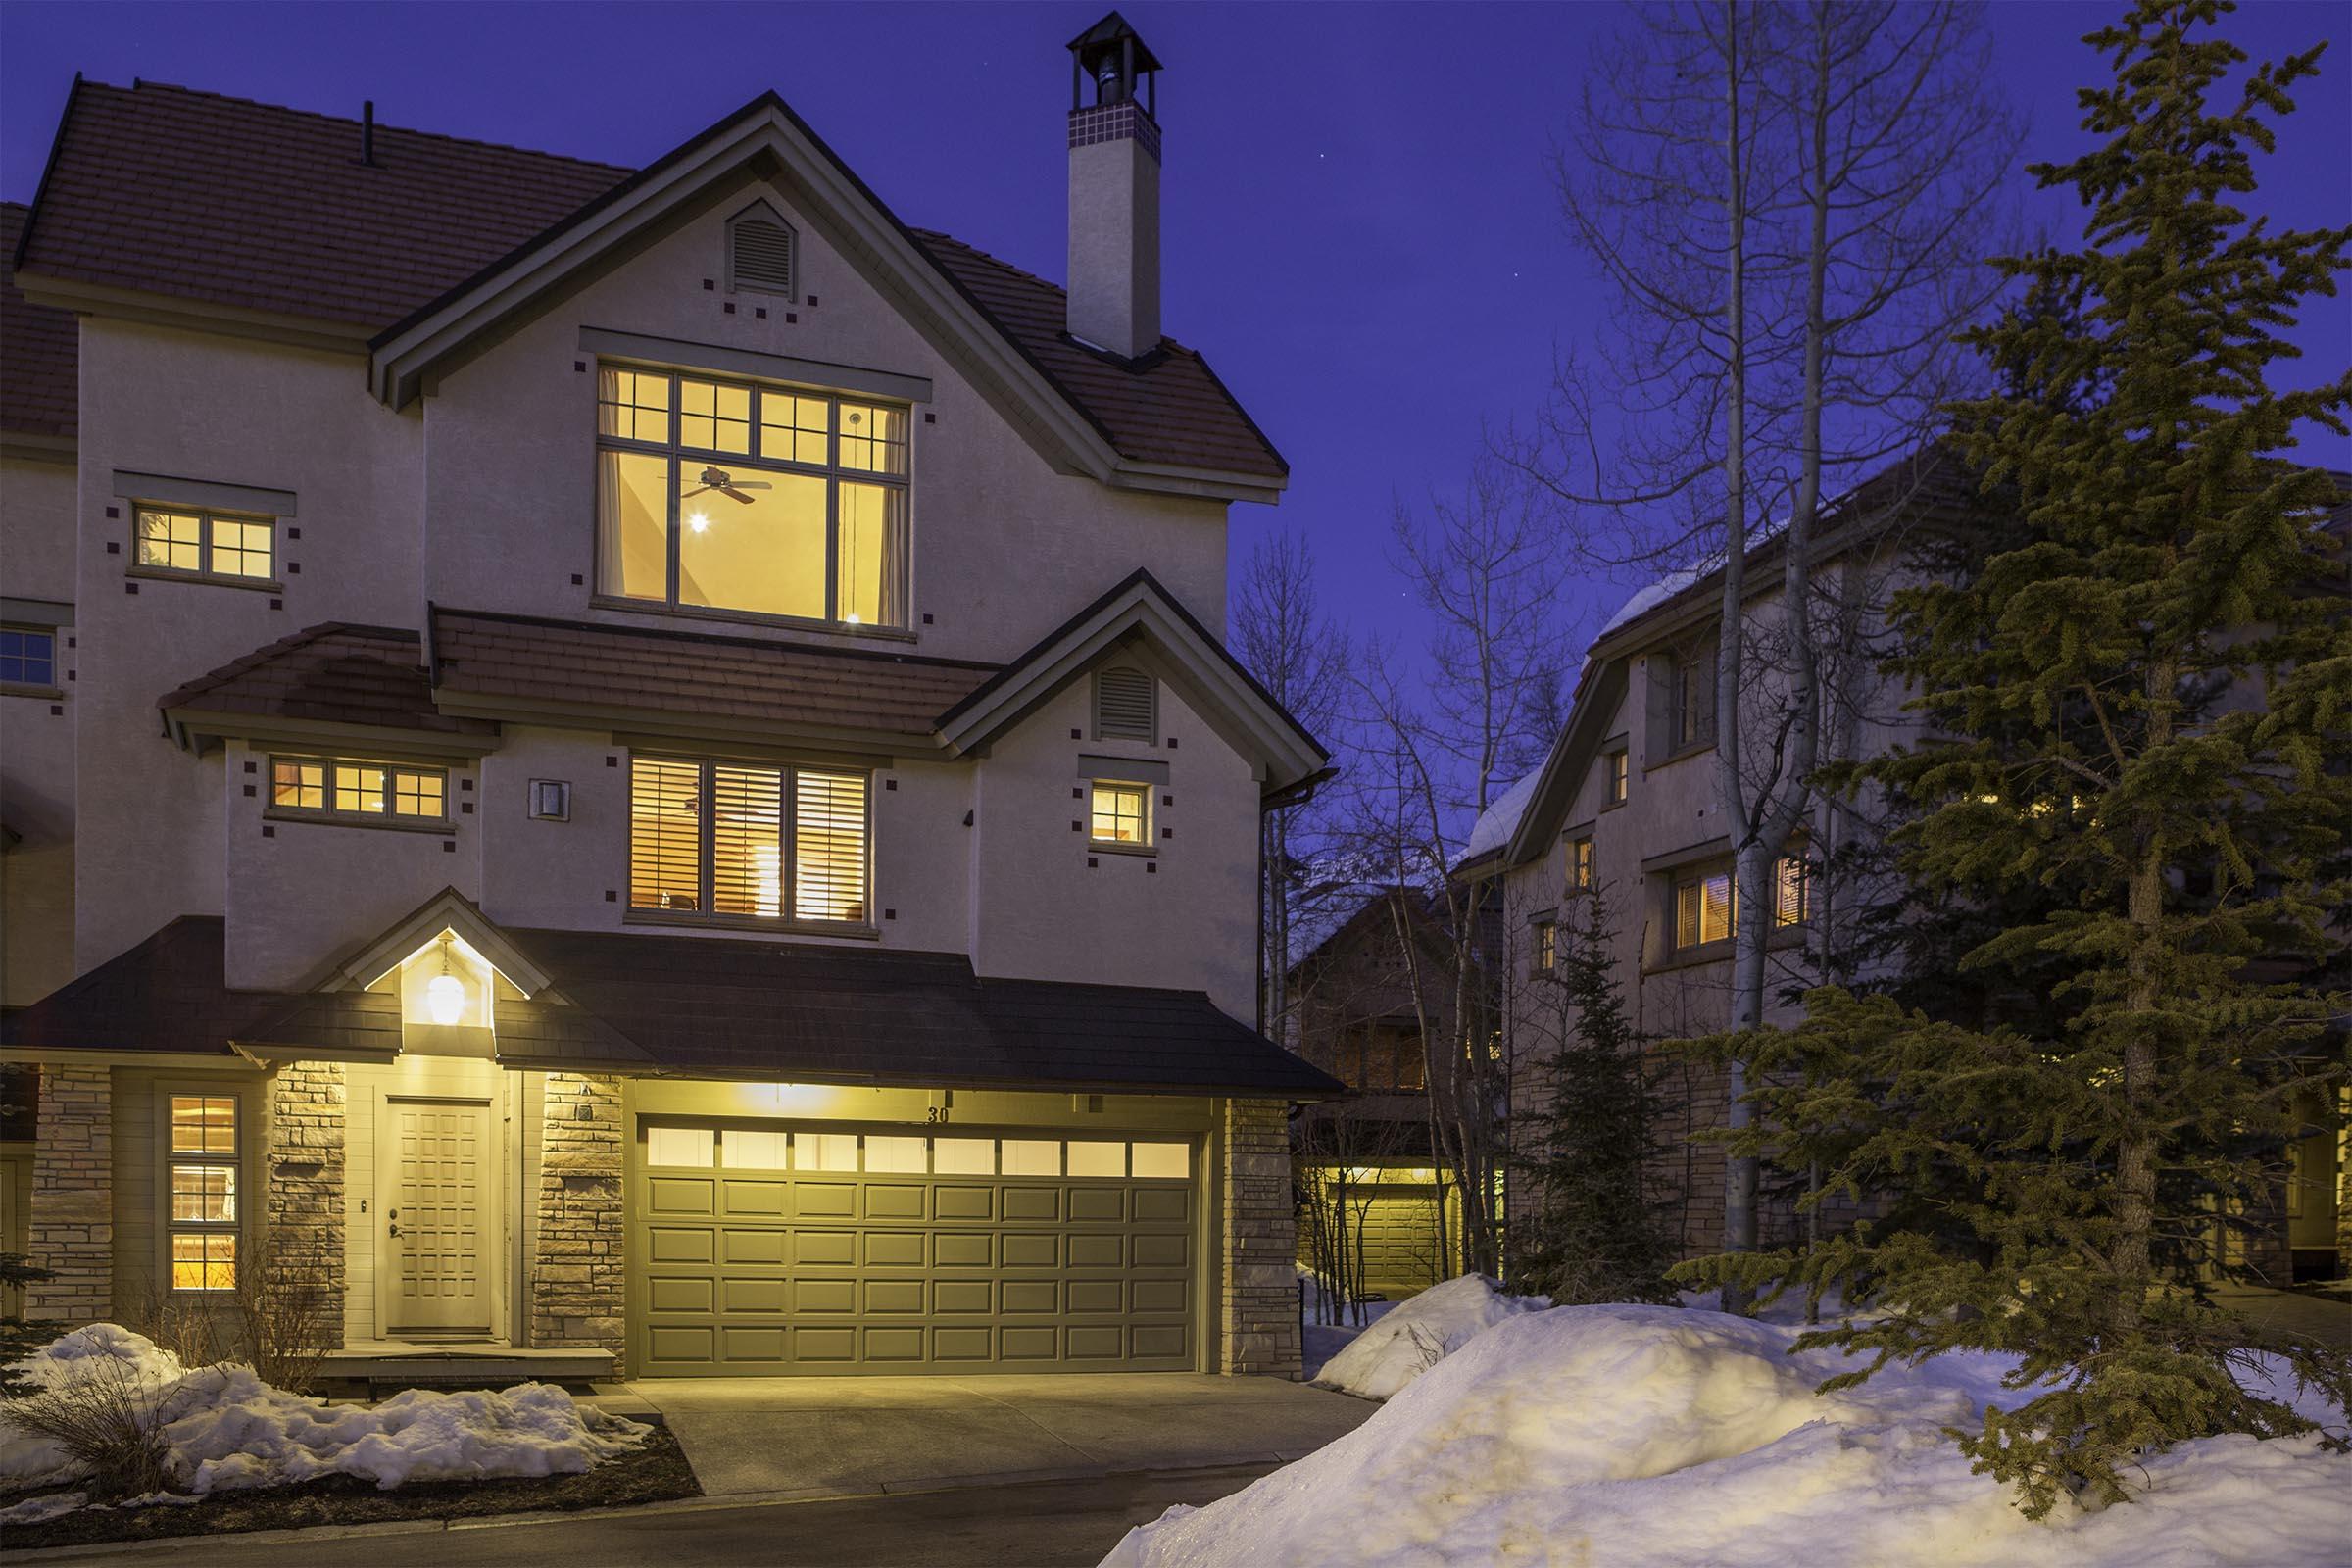 Condomínio para Venda às Aspen Ridge 30 110 Aspen Ridge Drive, Unit 30 Telluride, Colorado, 81435 Estados Unidos